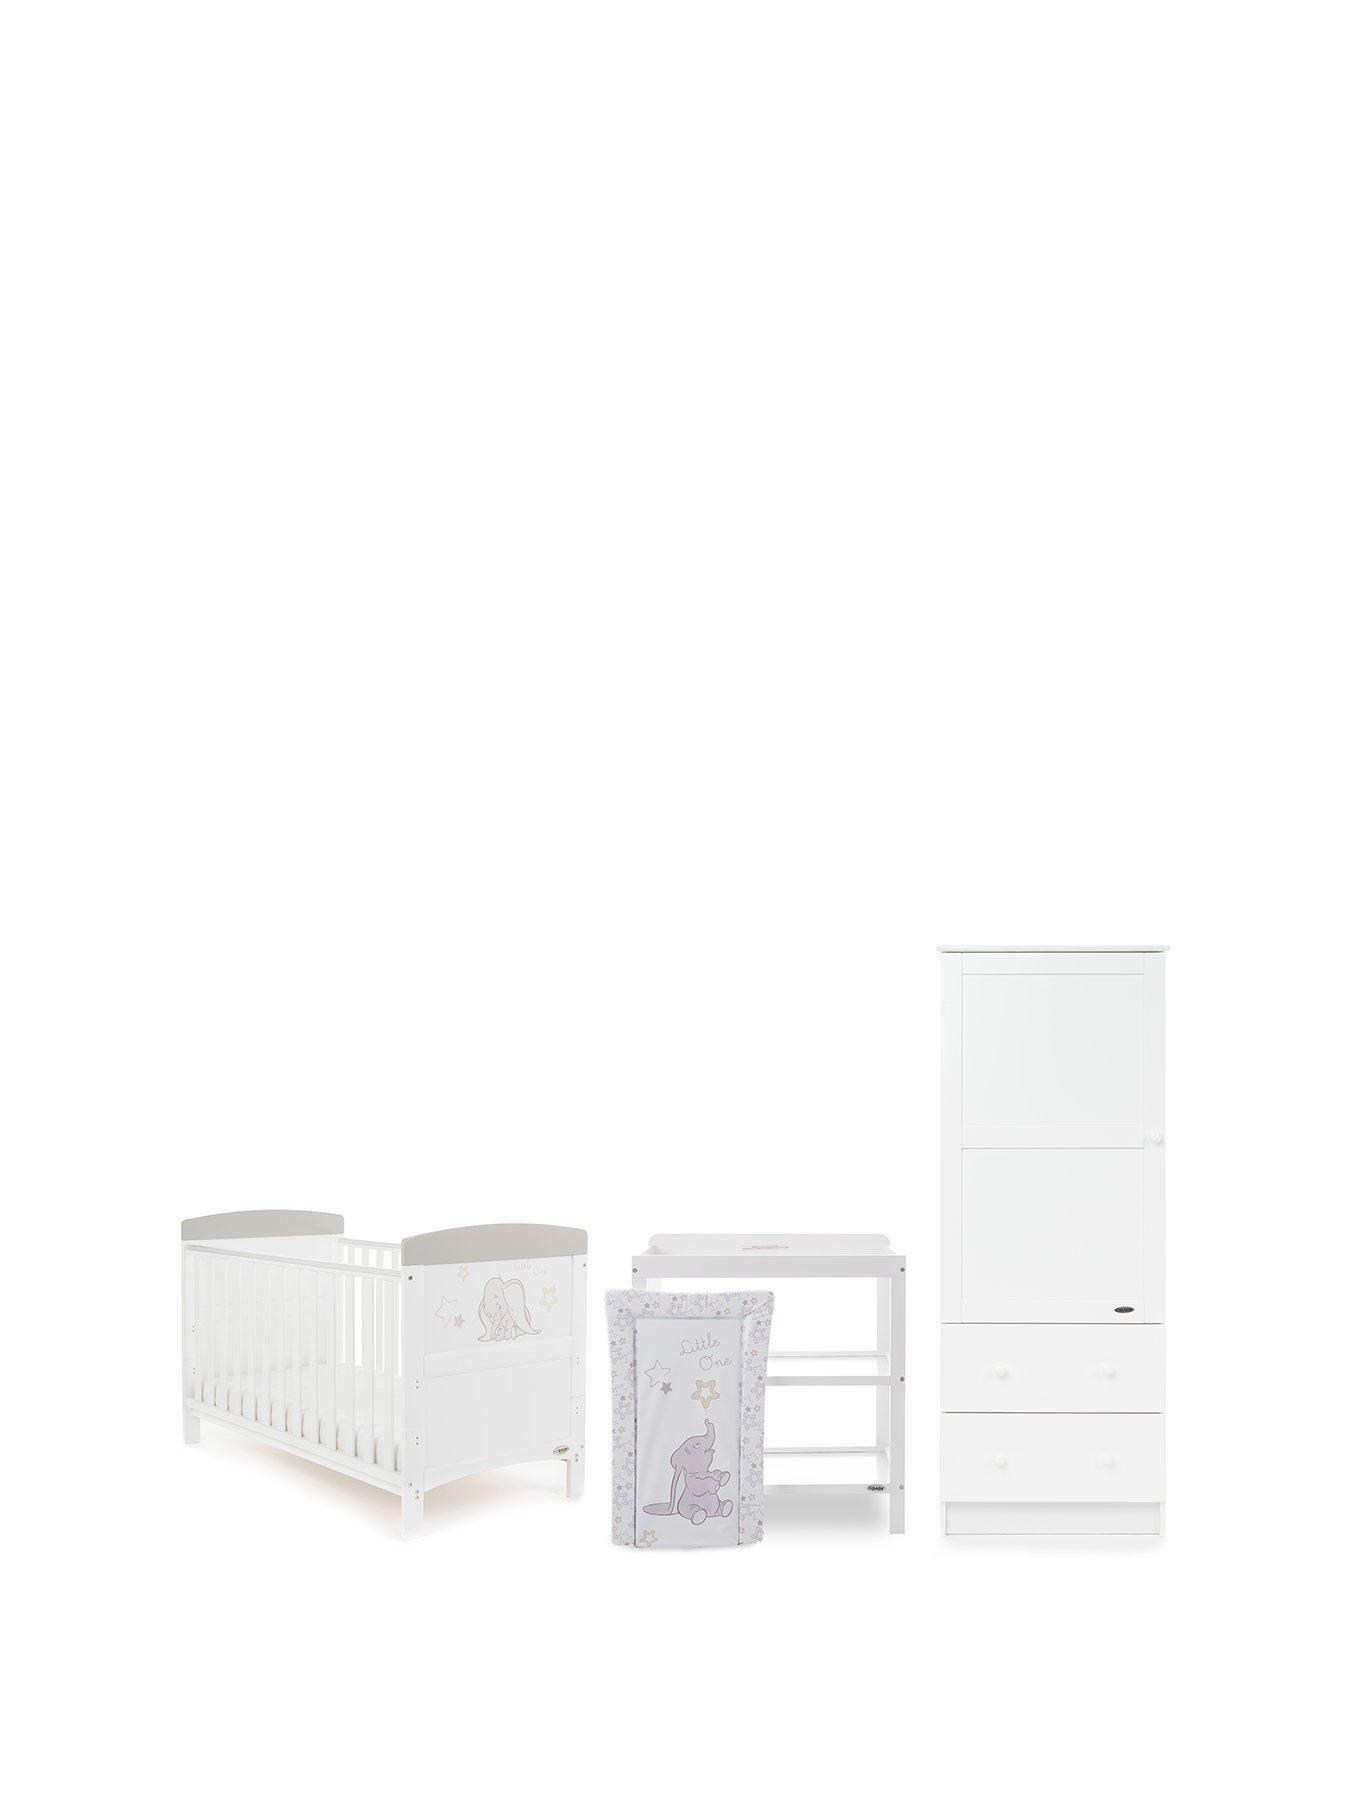 Obaby Dumbo 3 Piece Nursery Furniture Set Little One Nursery